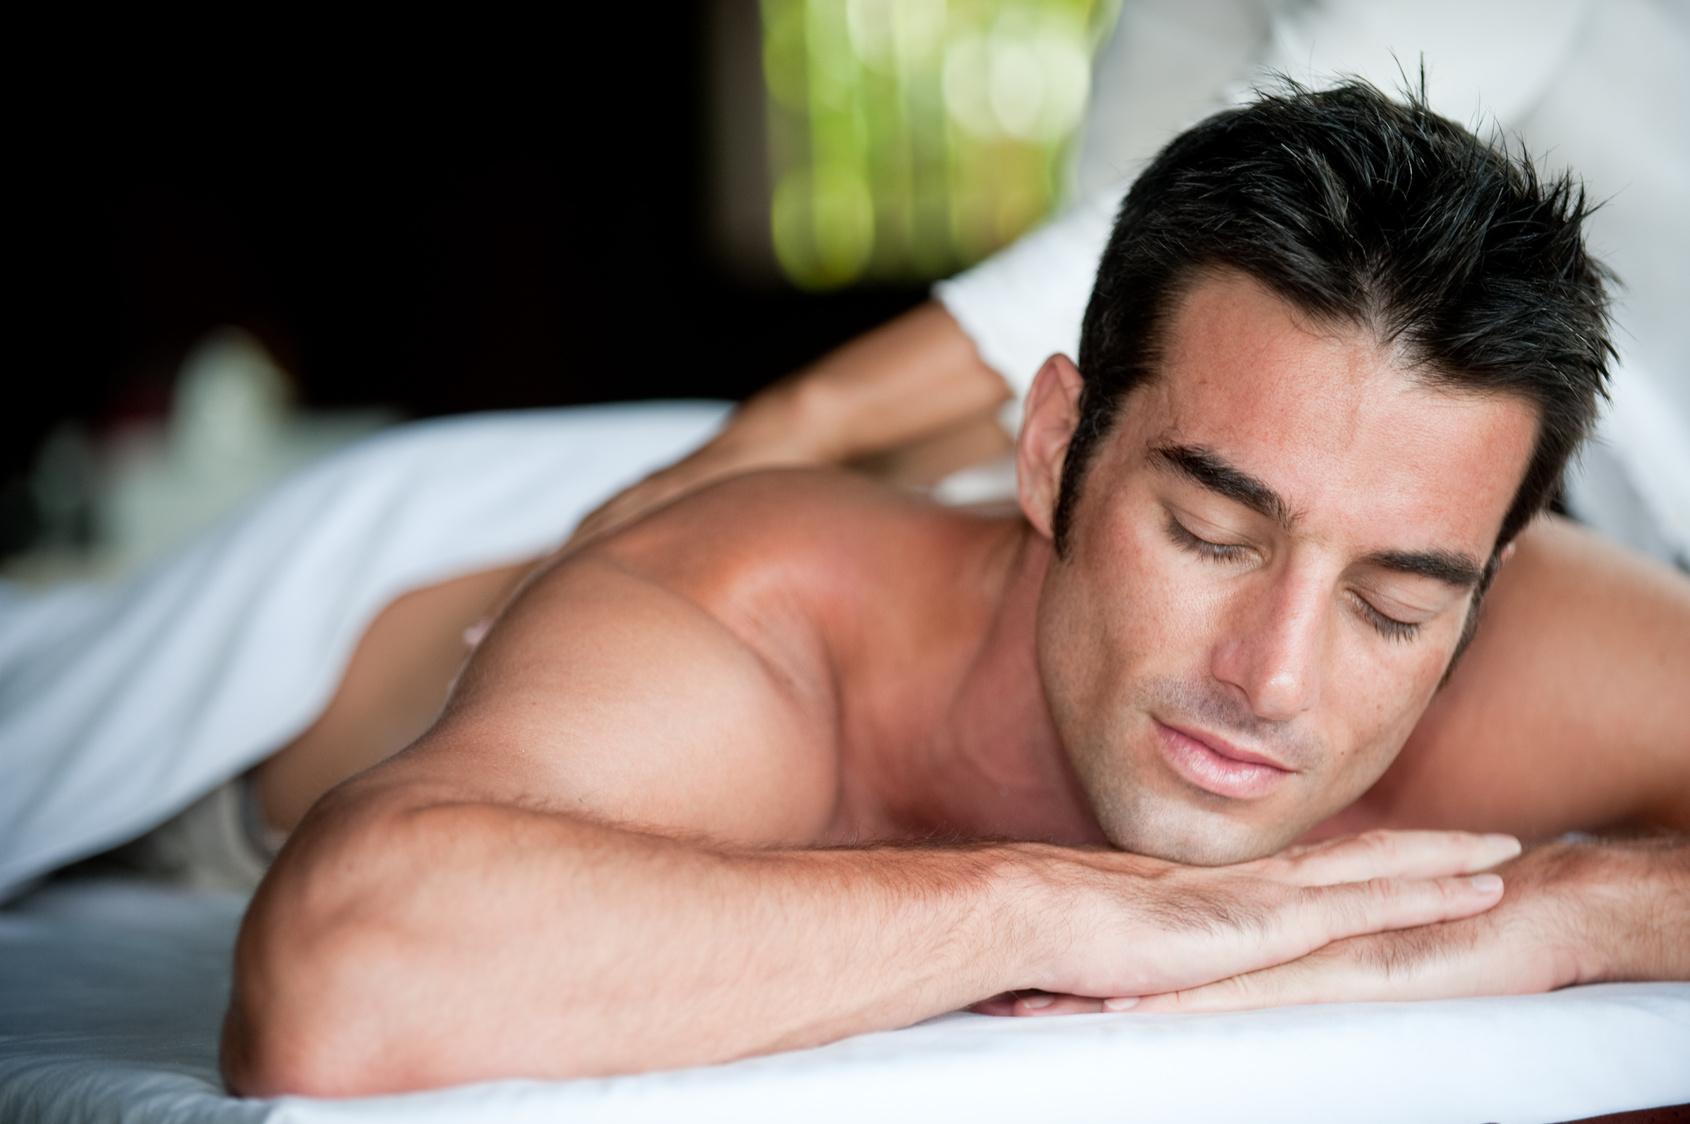 Massage Therapy - Image 3